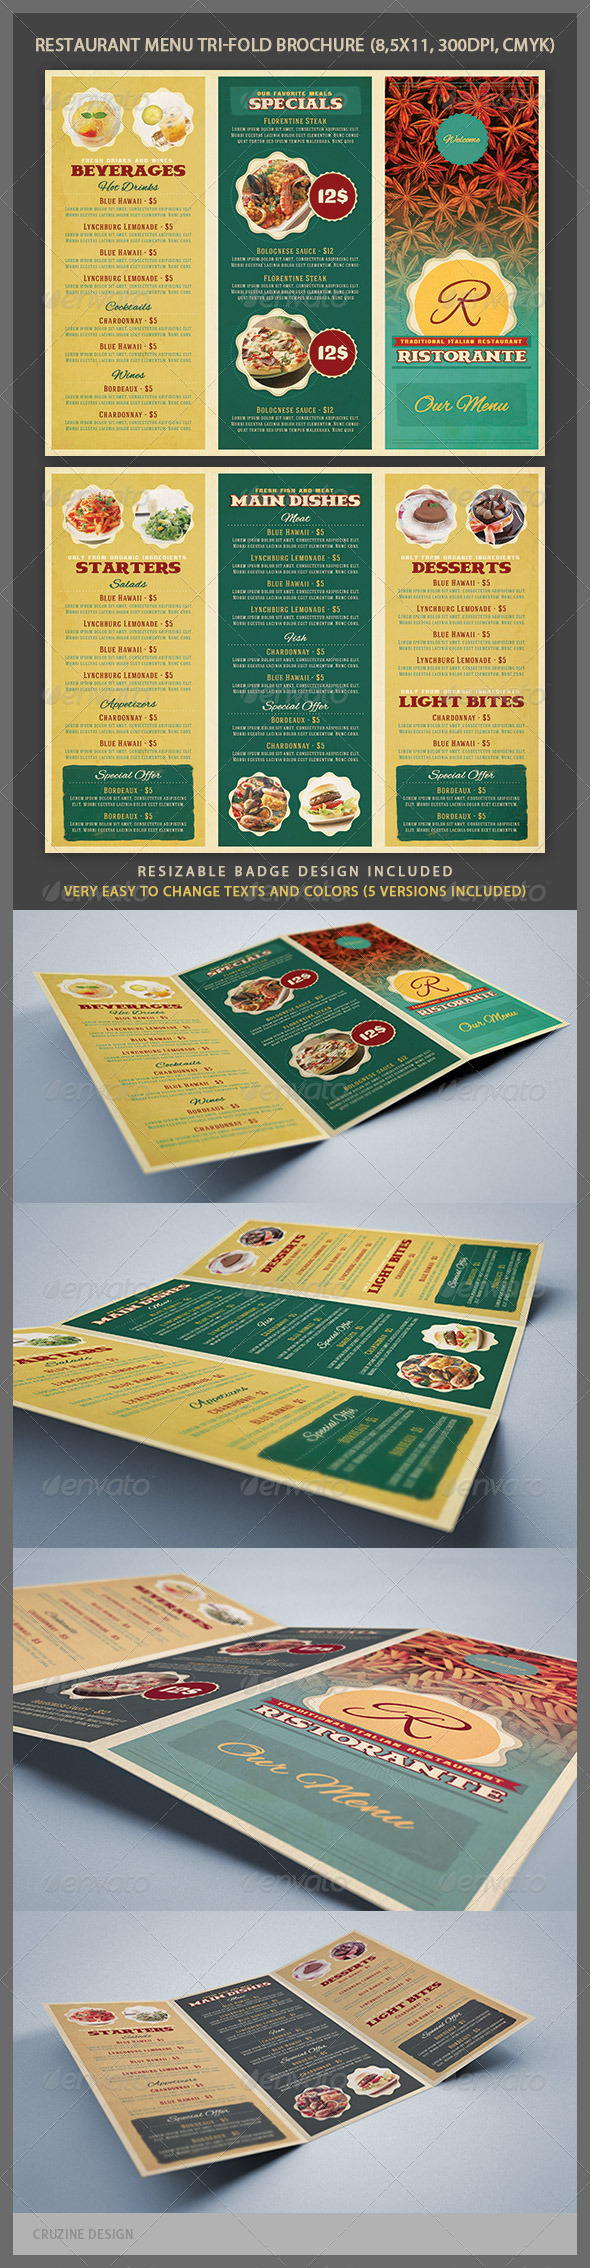 GraphicRiver Restaurant Menu Tri-fold Brochure 4048749